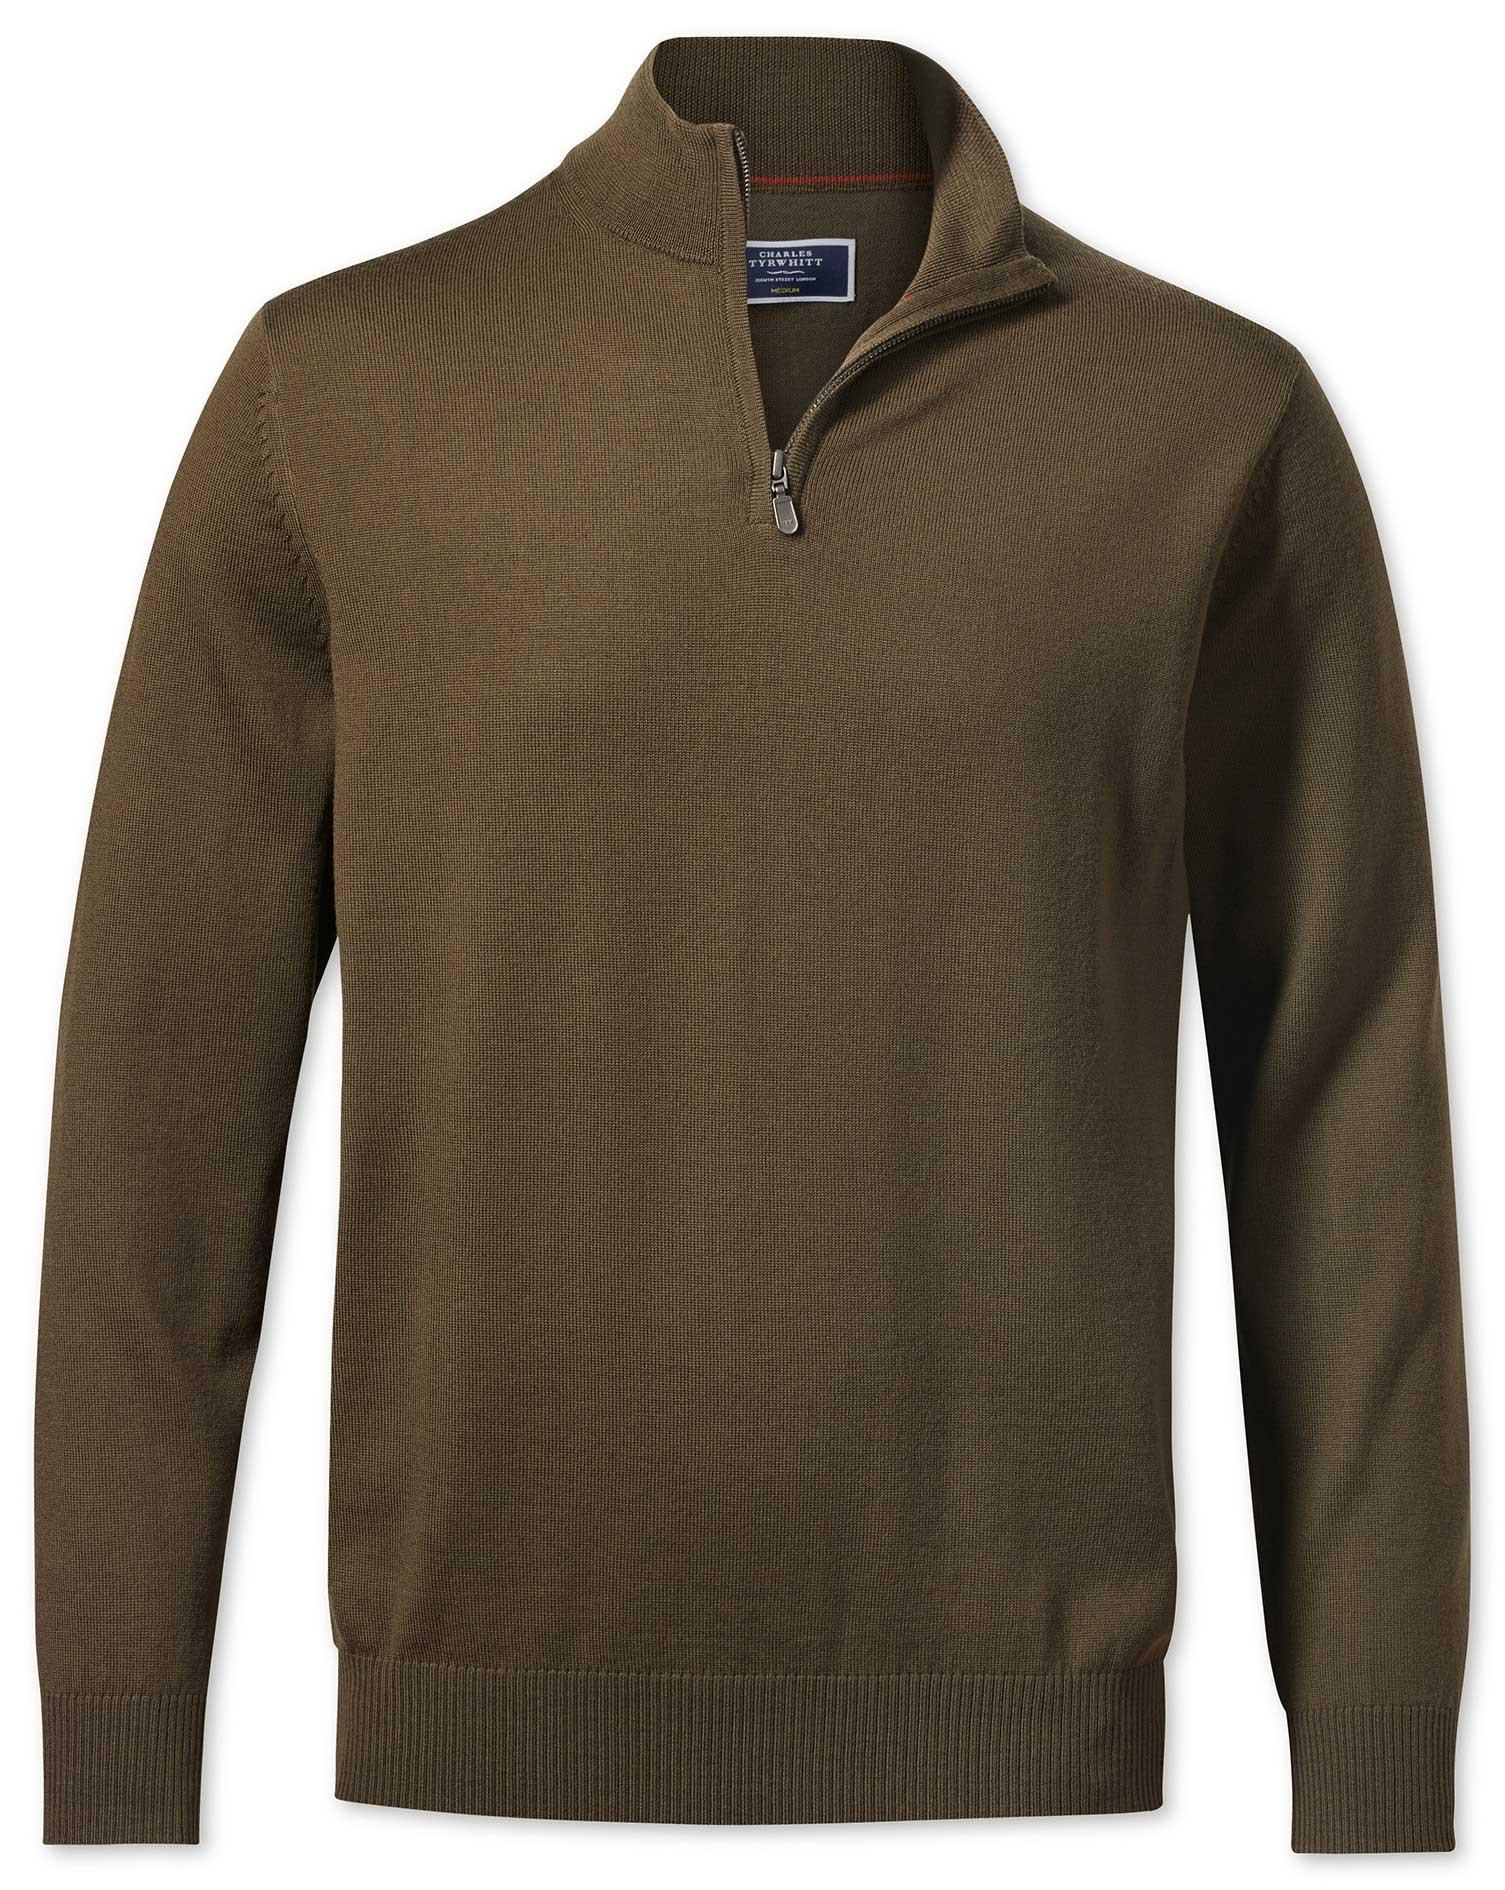 Olive Zip Neck Merino Wool Jumper Size XS by Charles Tyrwhitt